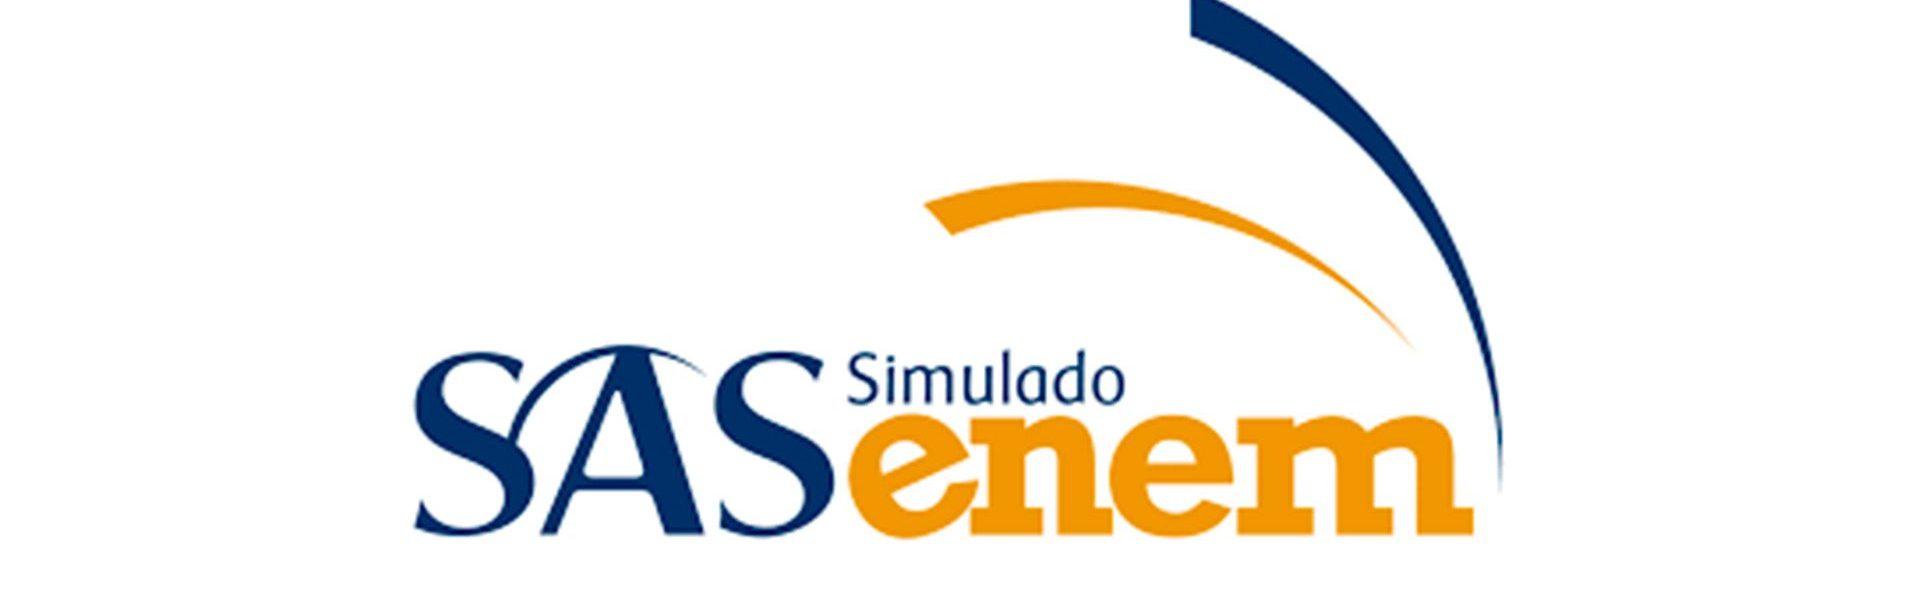 Imagem Marca Simulado SAS enem